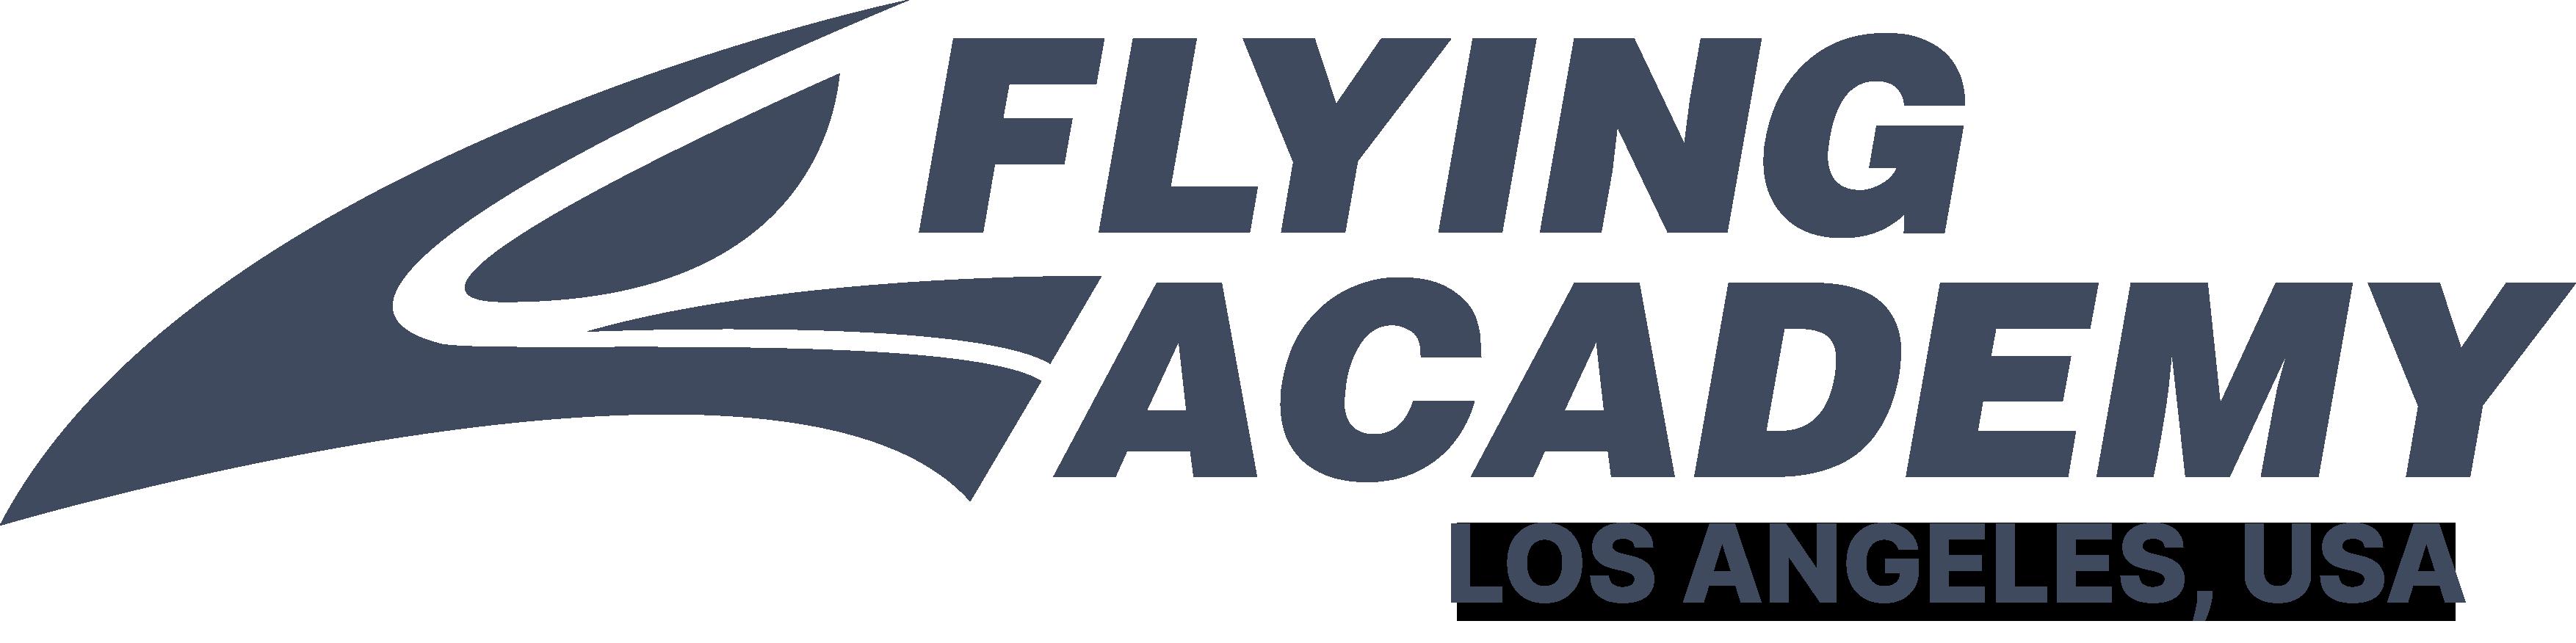 Flying Academy Miami | Professional Pilot Training